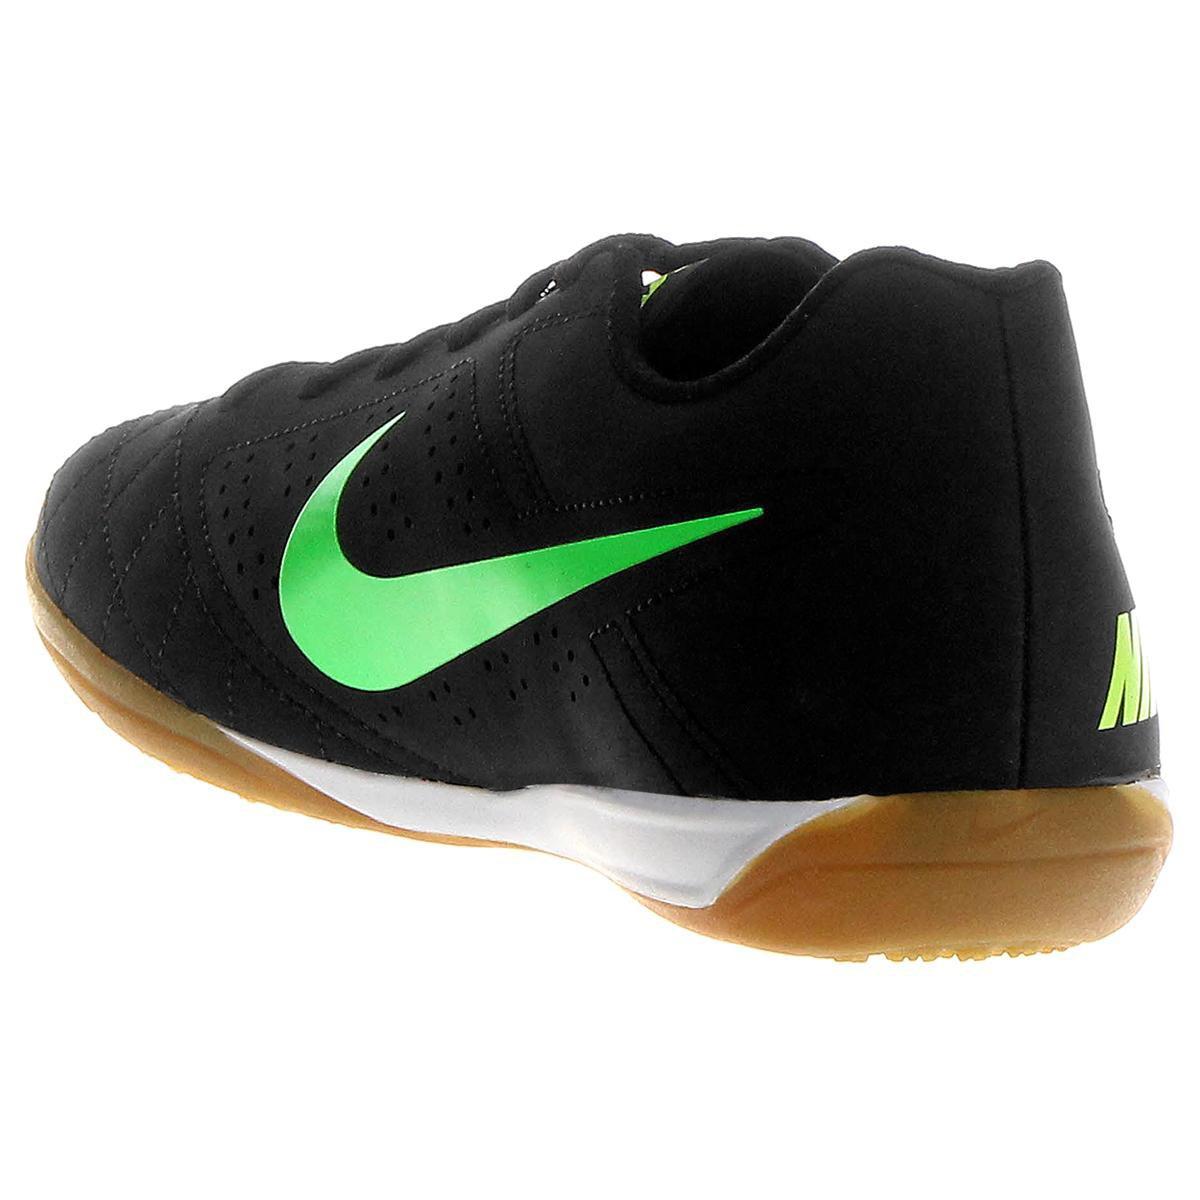 e1575215bf Chuteira Futsal Nike Beco 2 Masculina Preto e Verde Limão - Compre ...